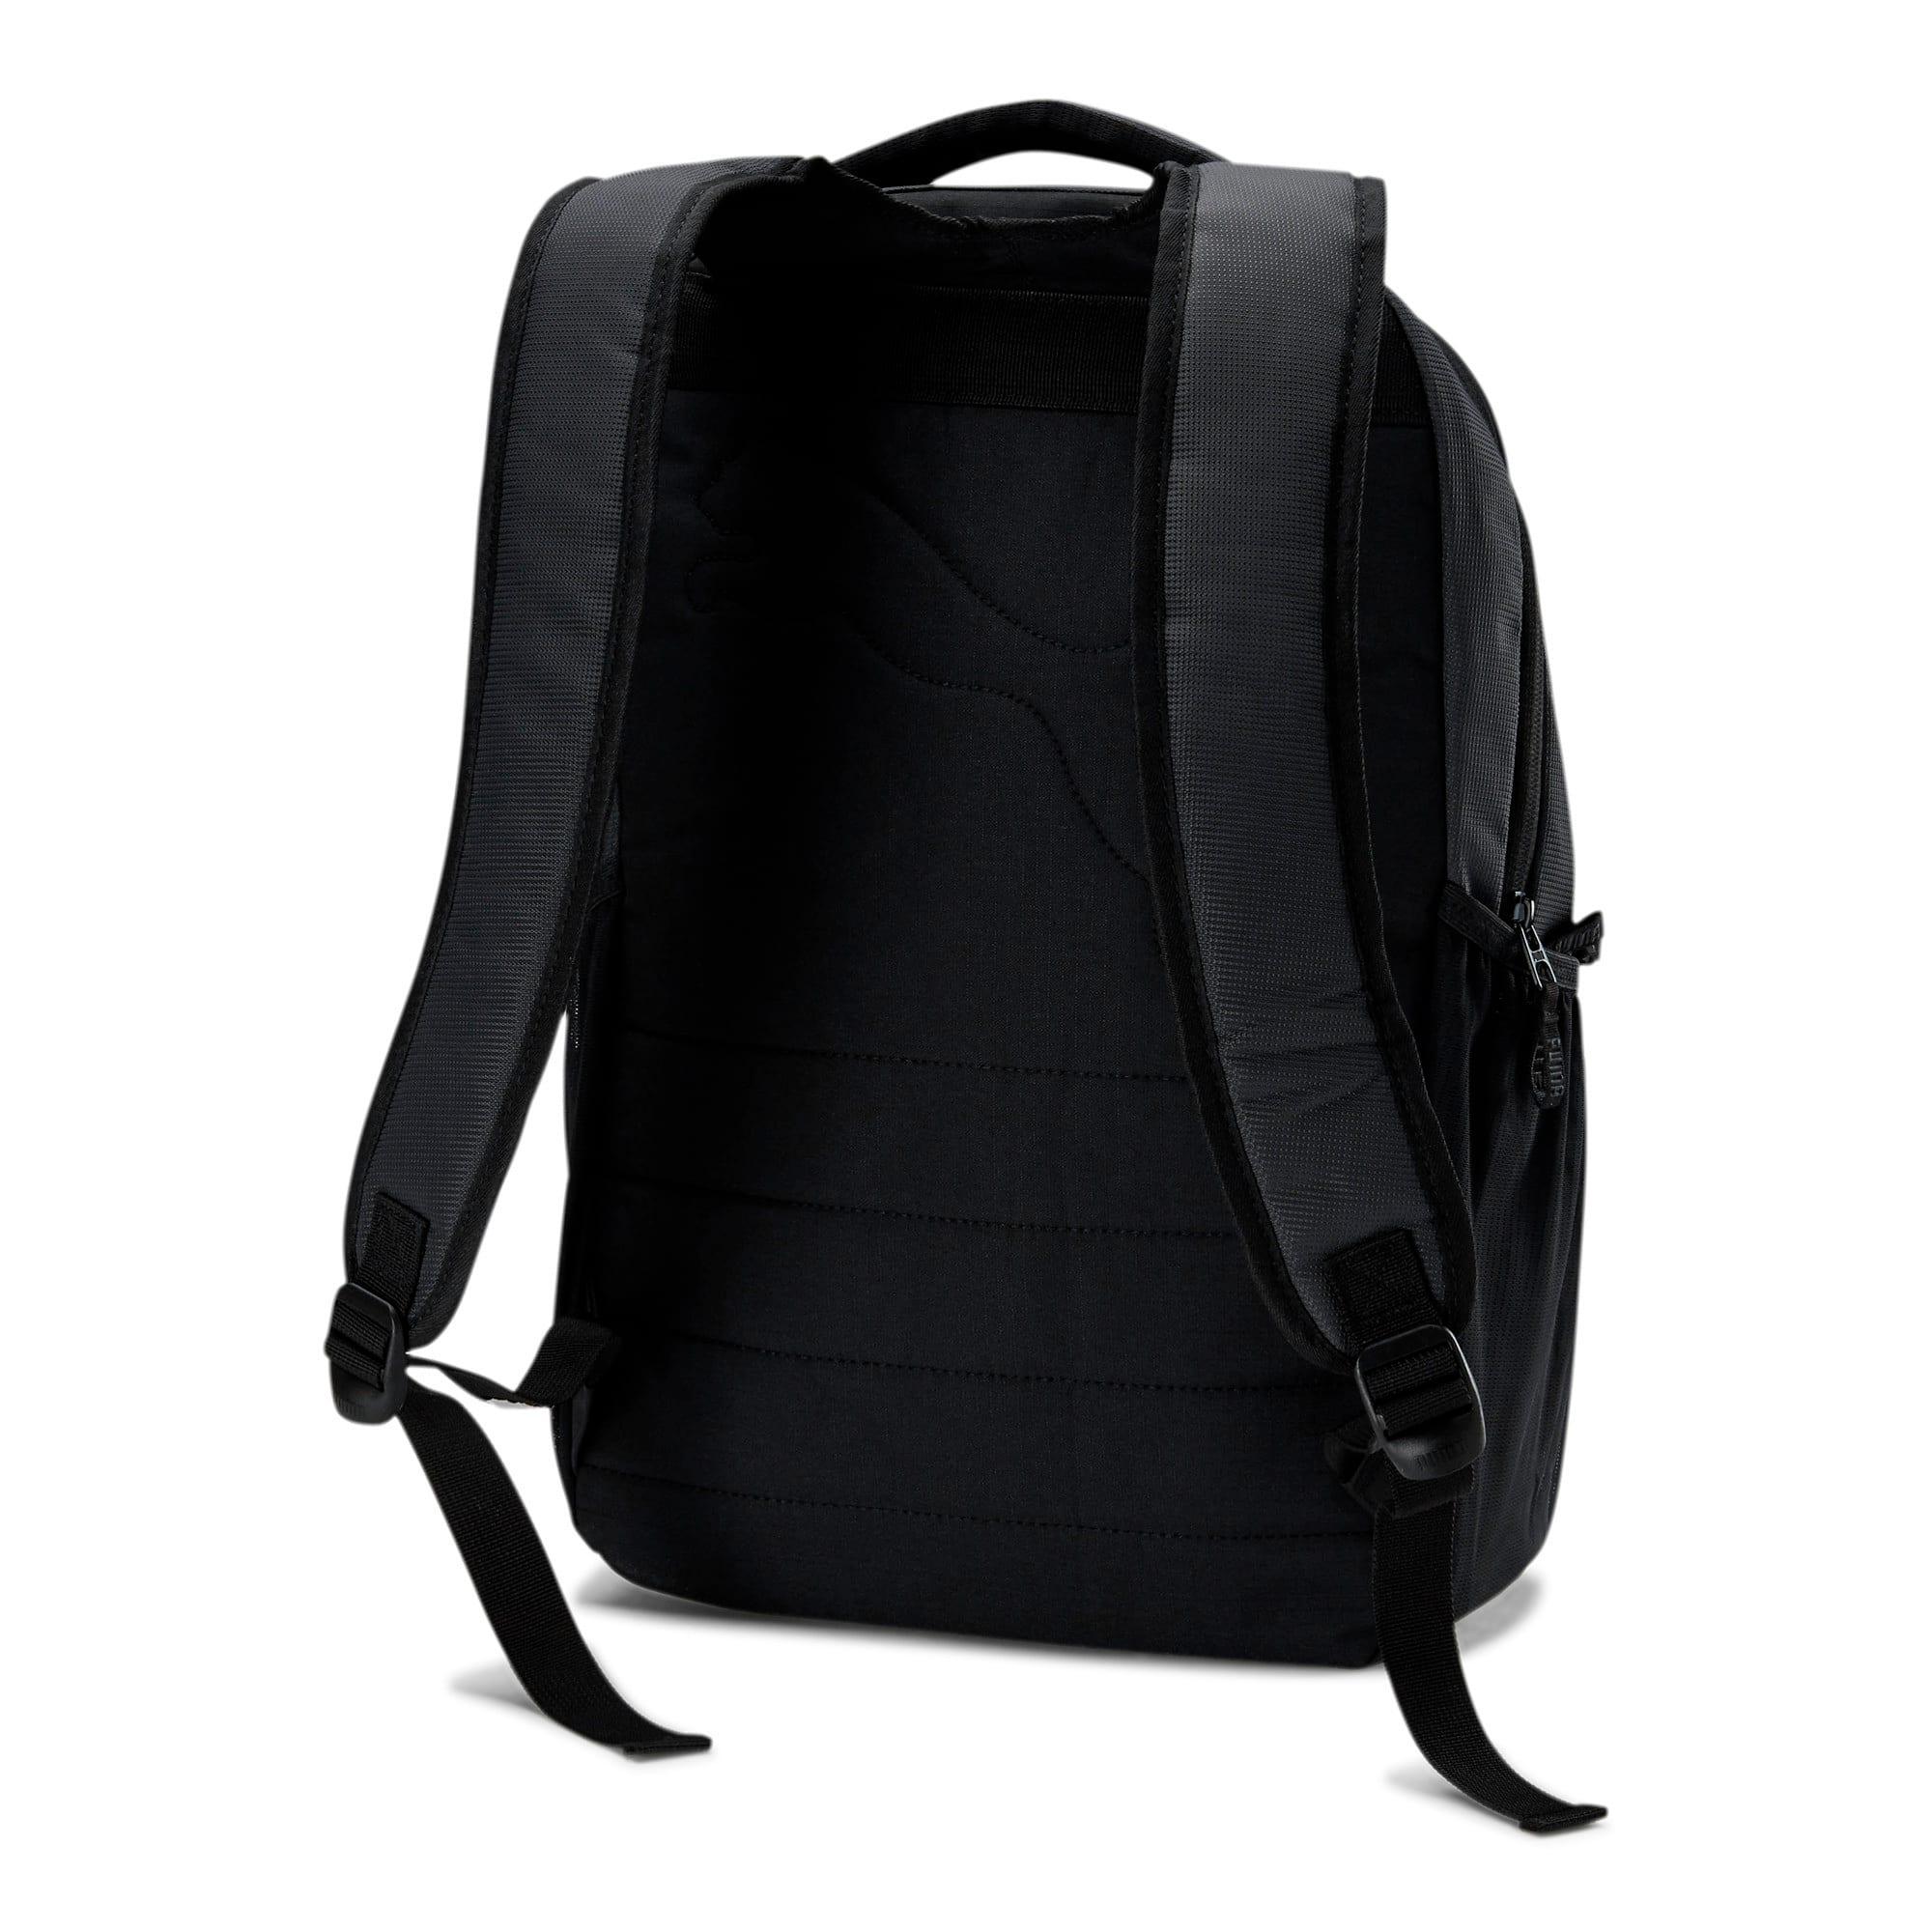 Thumbnail 2 of Formation 2.0 Ball Backpack, Dark Grey, medium